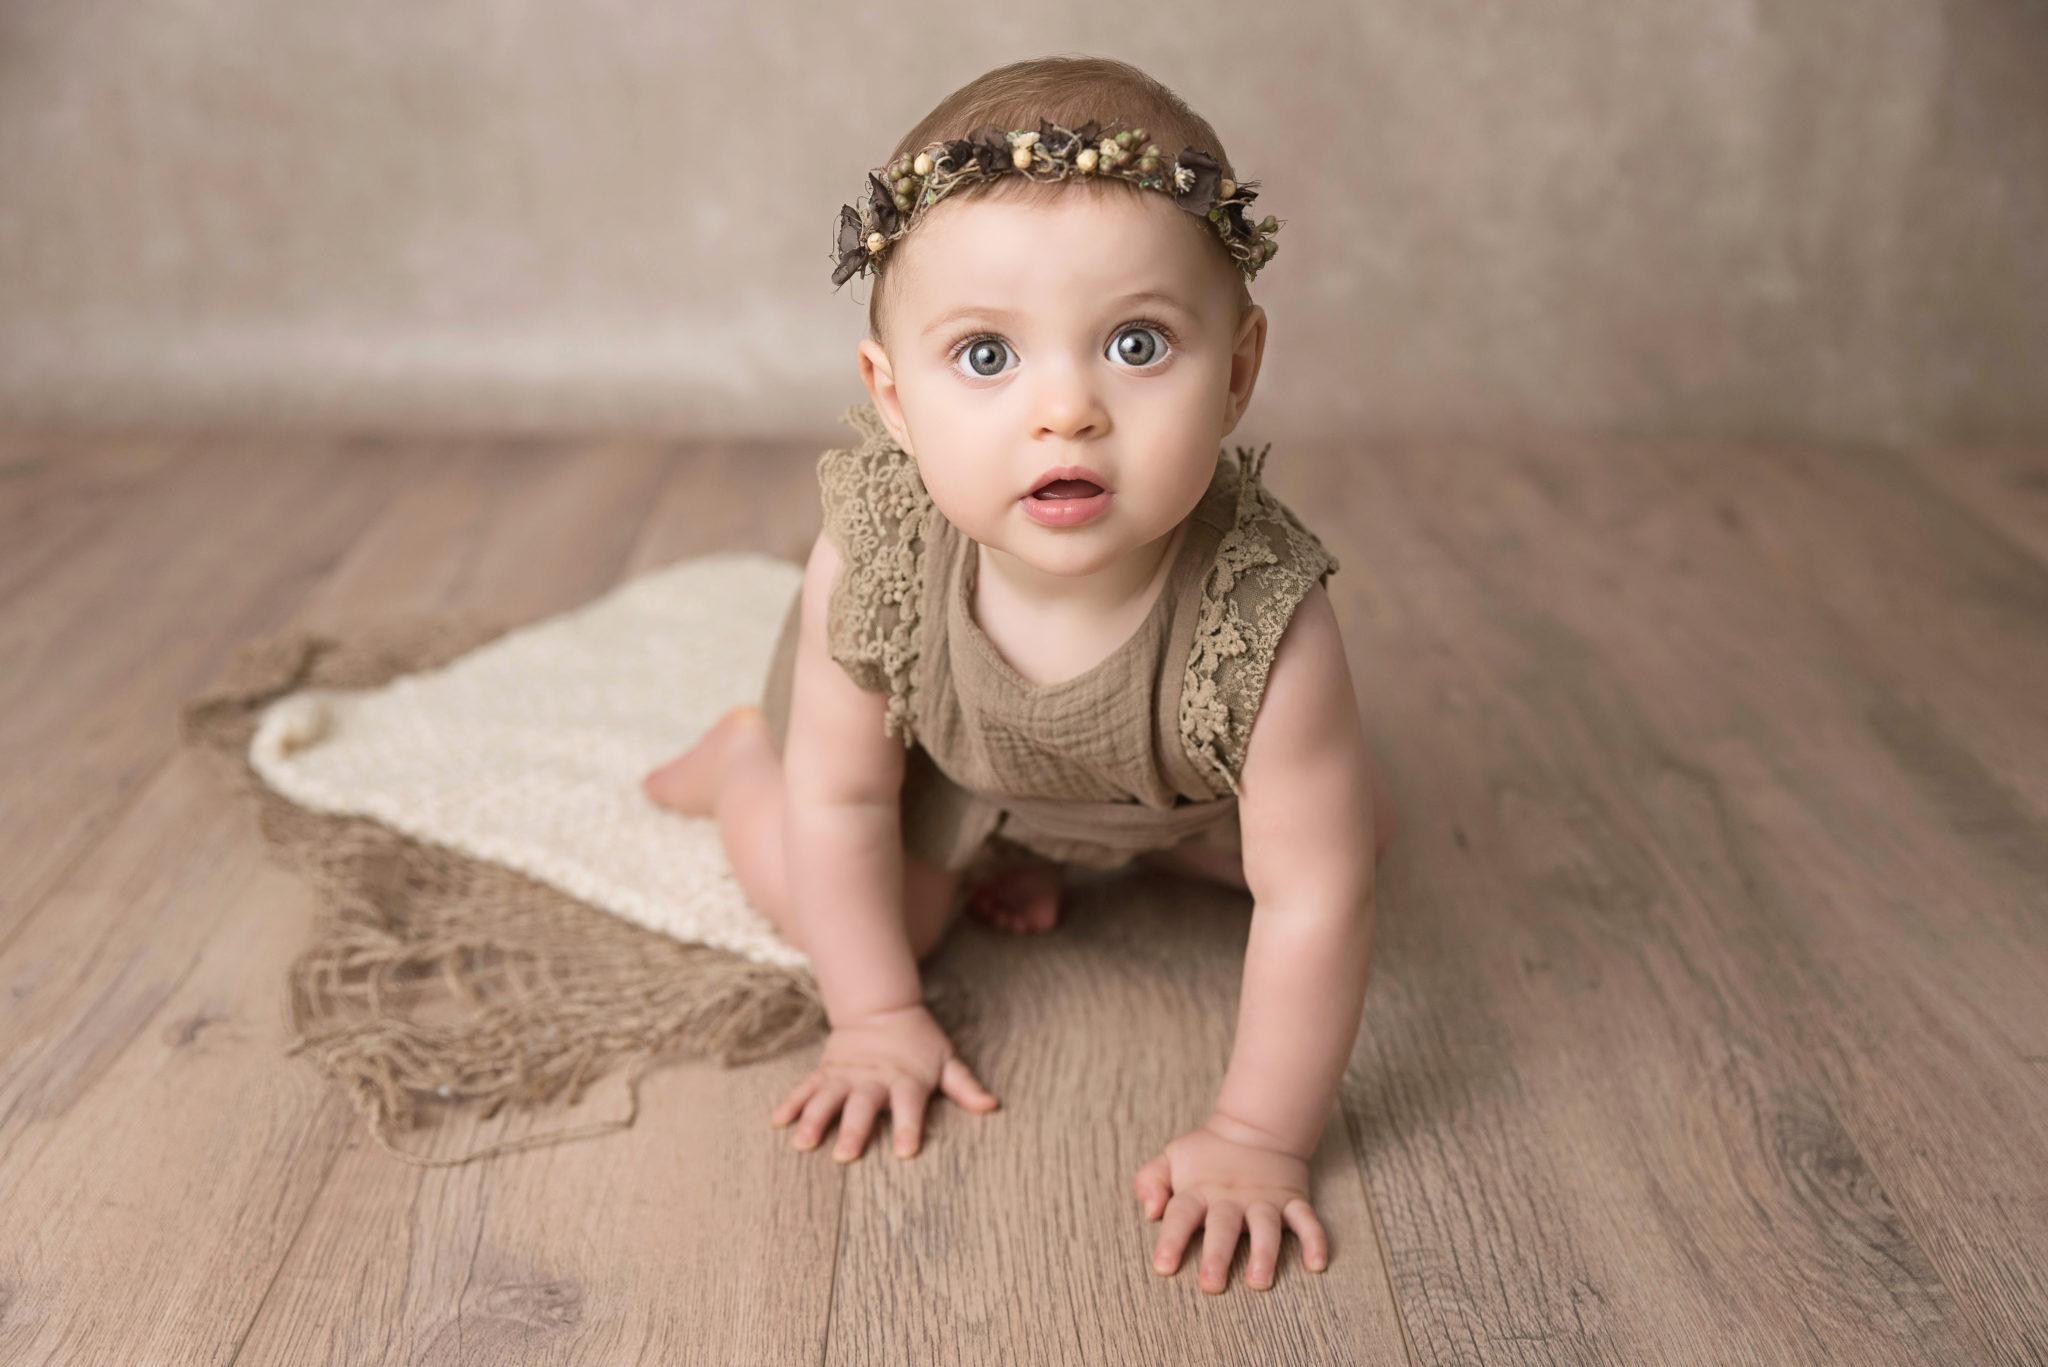 Photographe bébé oise seine et marne val d'oise ainse (26)